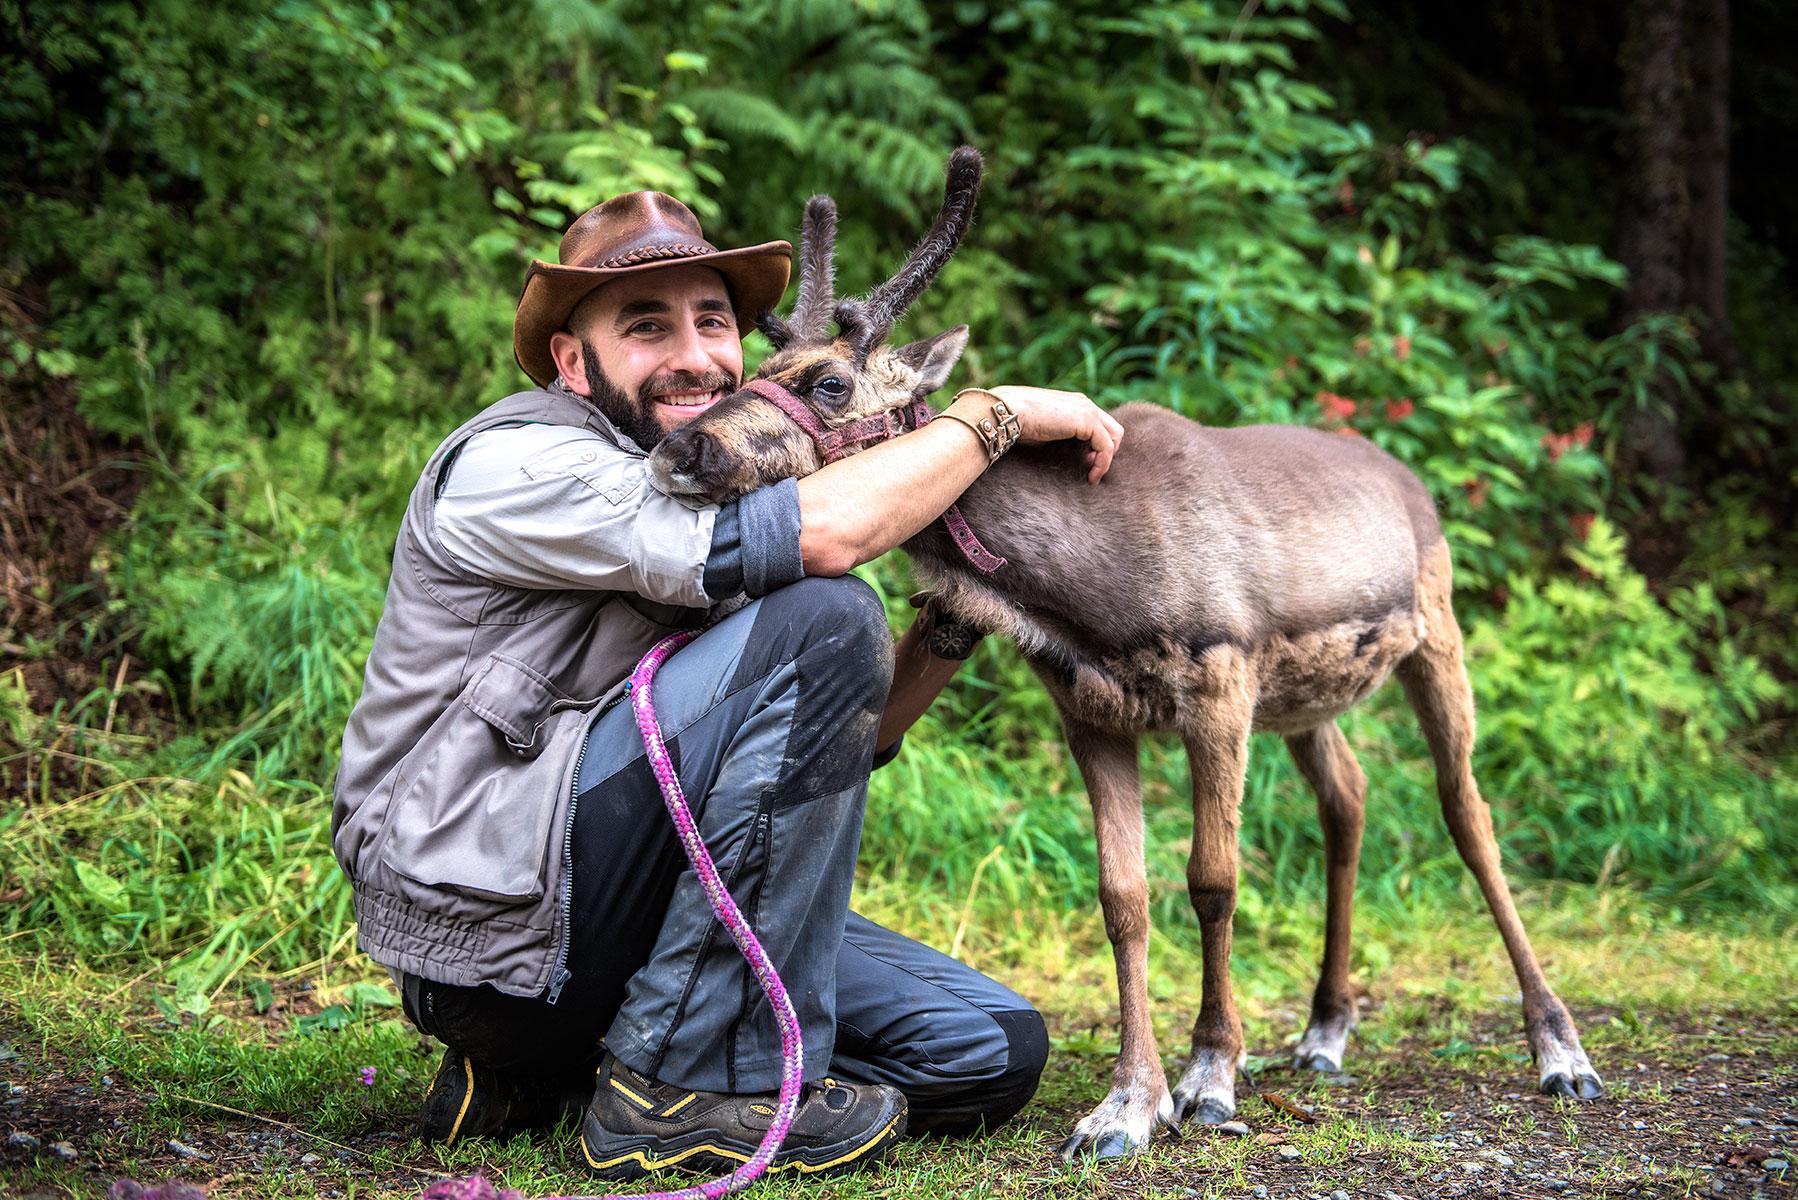 austin-trigg-brave-wilderness-alaska-BW-Coyote-Hold-Reindeer.jpg